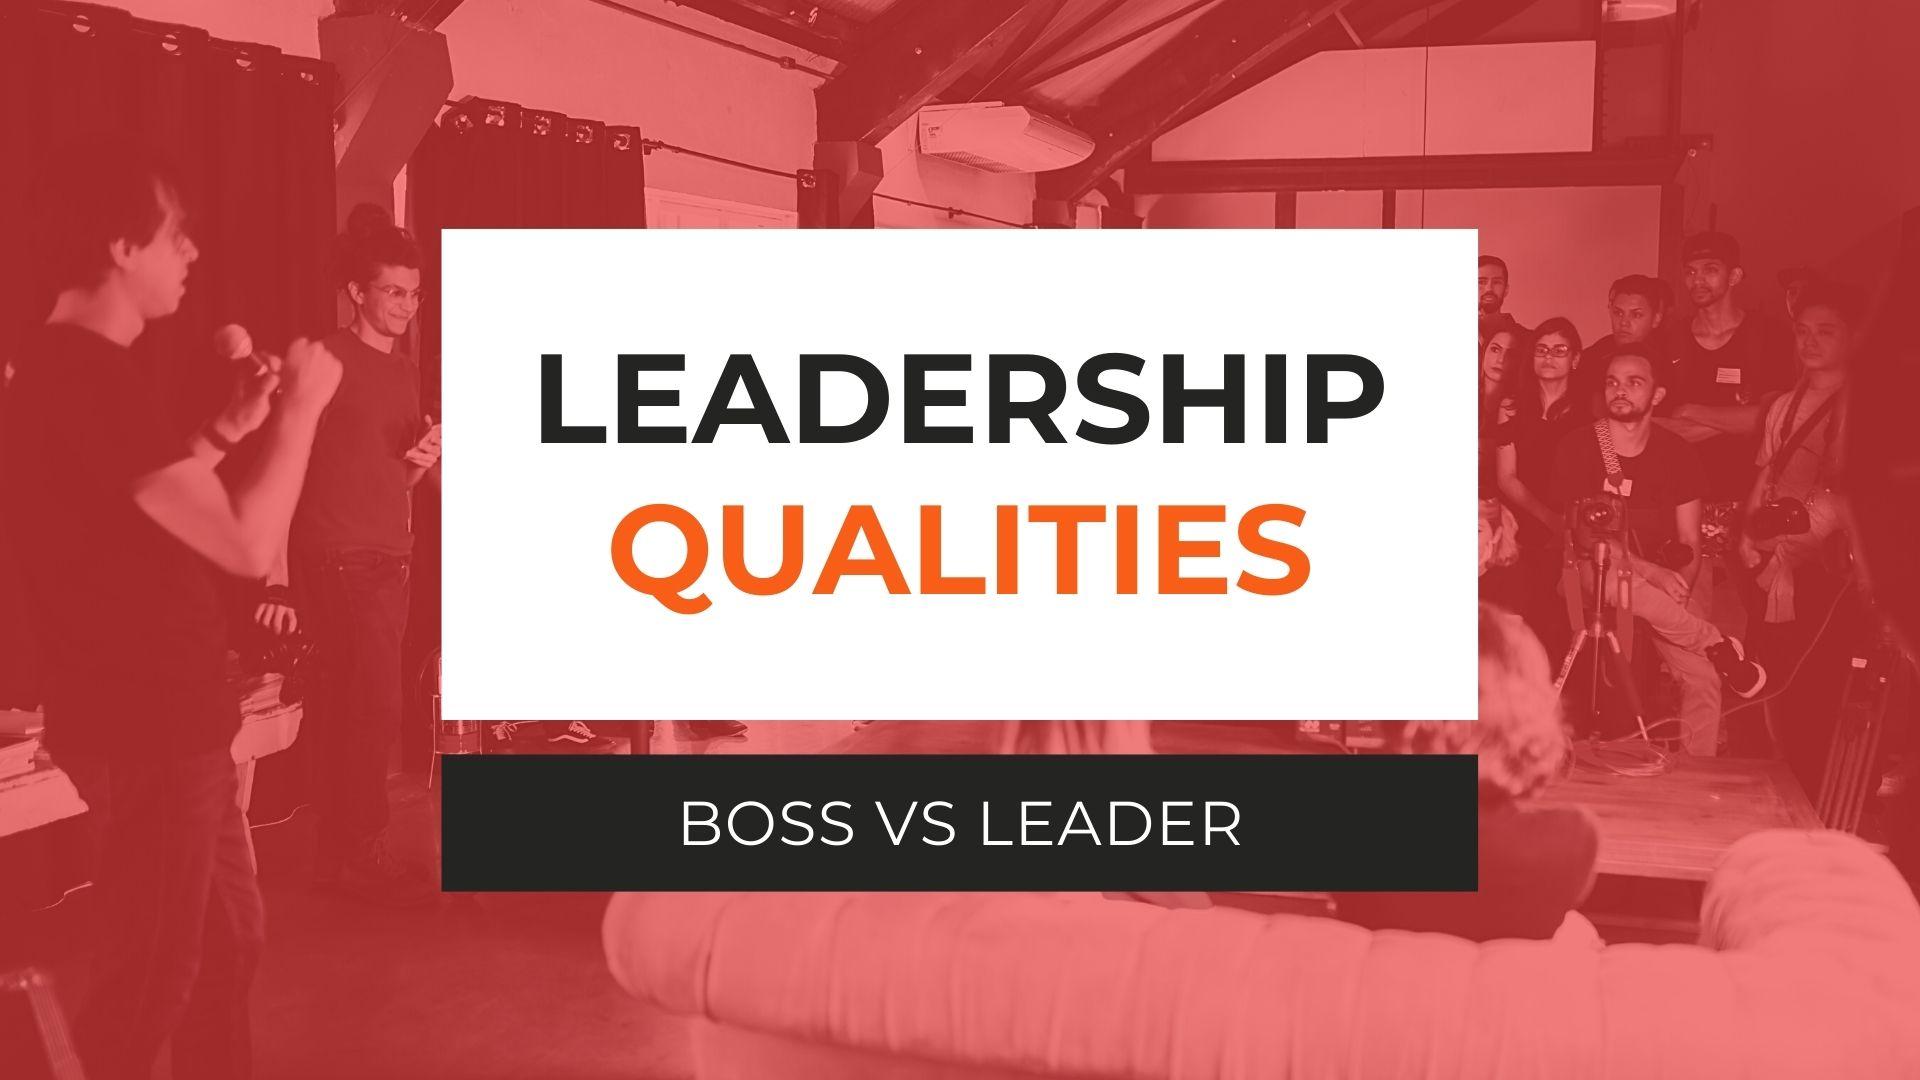 Leadership Qualities Boss vs Leader Course Image GoEdu